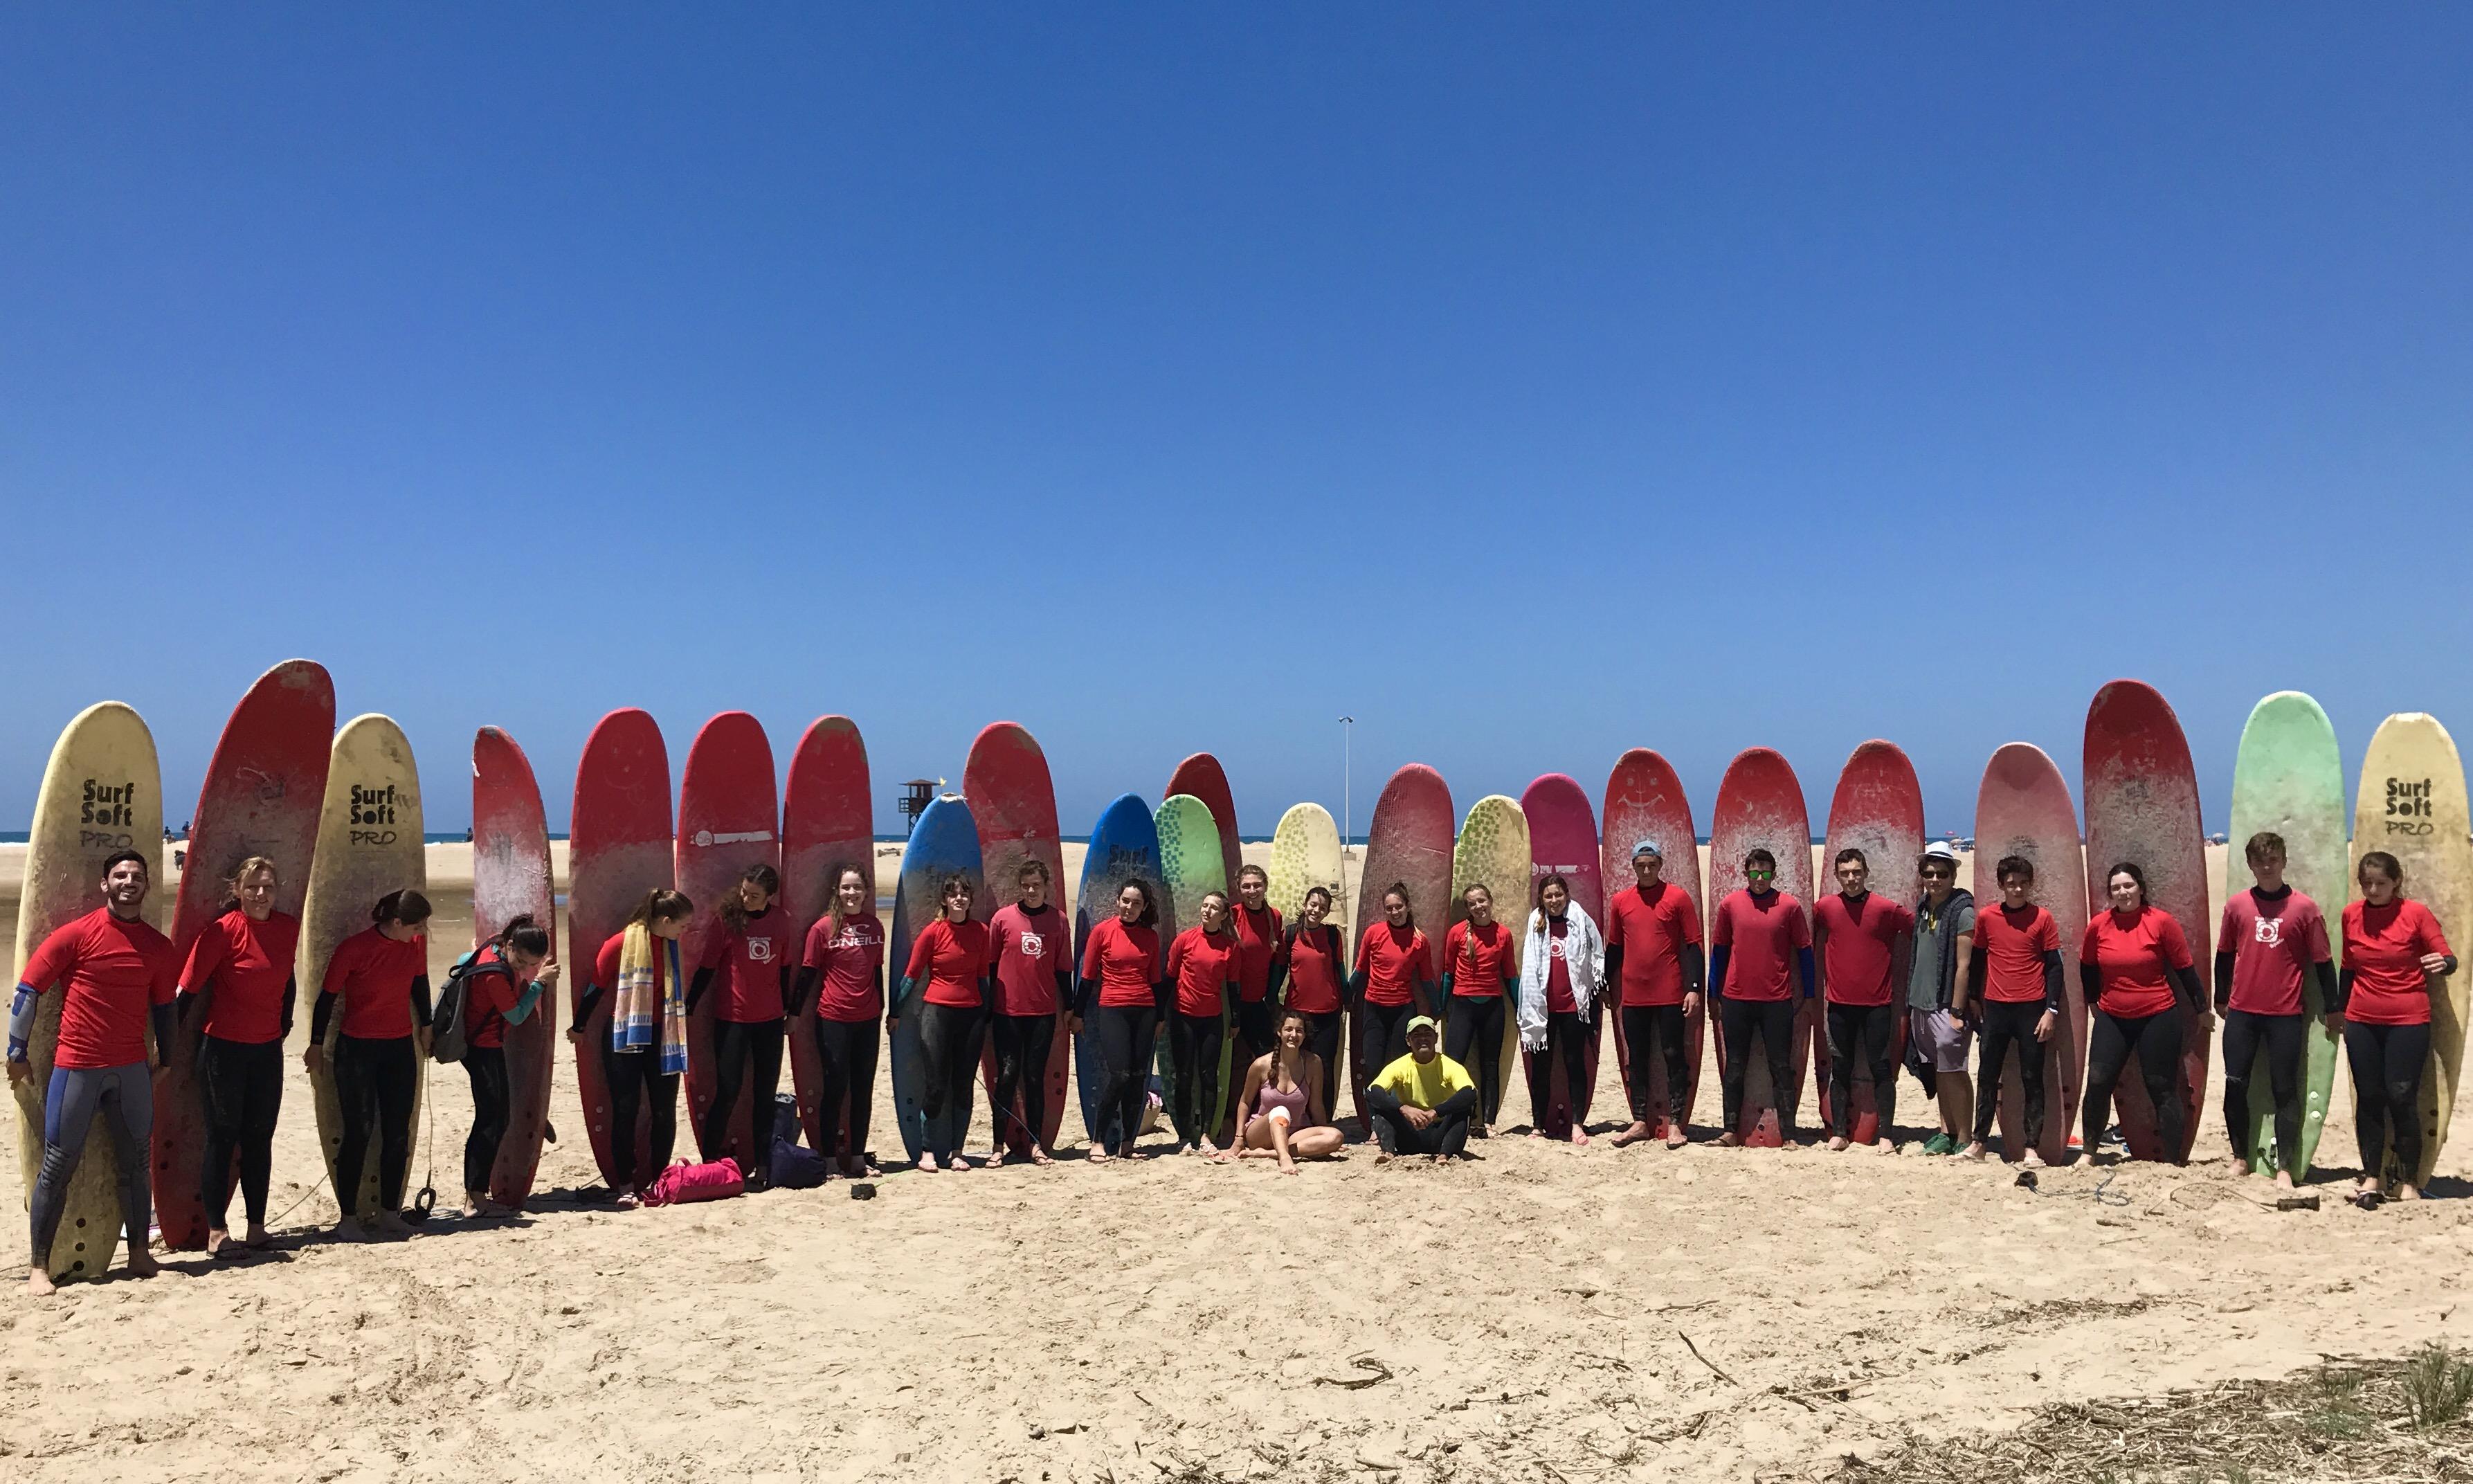 Surfcamp Surfschool Conil in Conil de la Frontera, Andalusien, Spanien